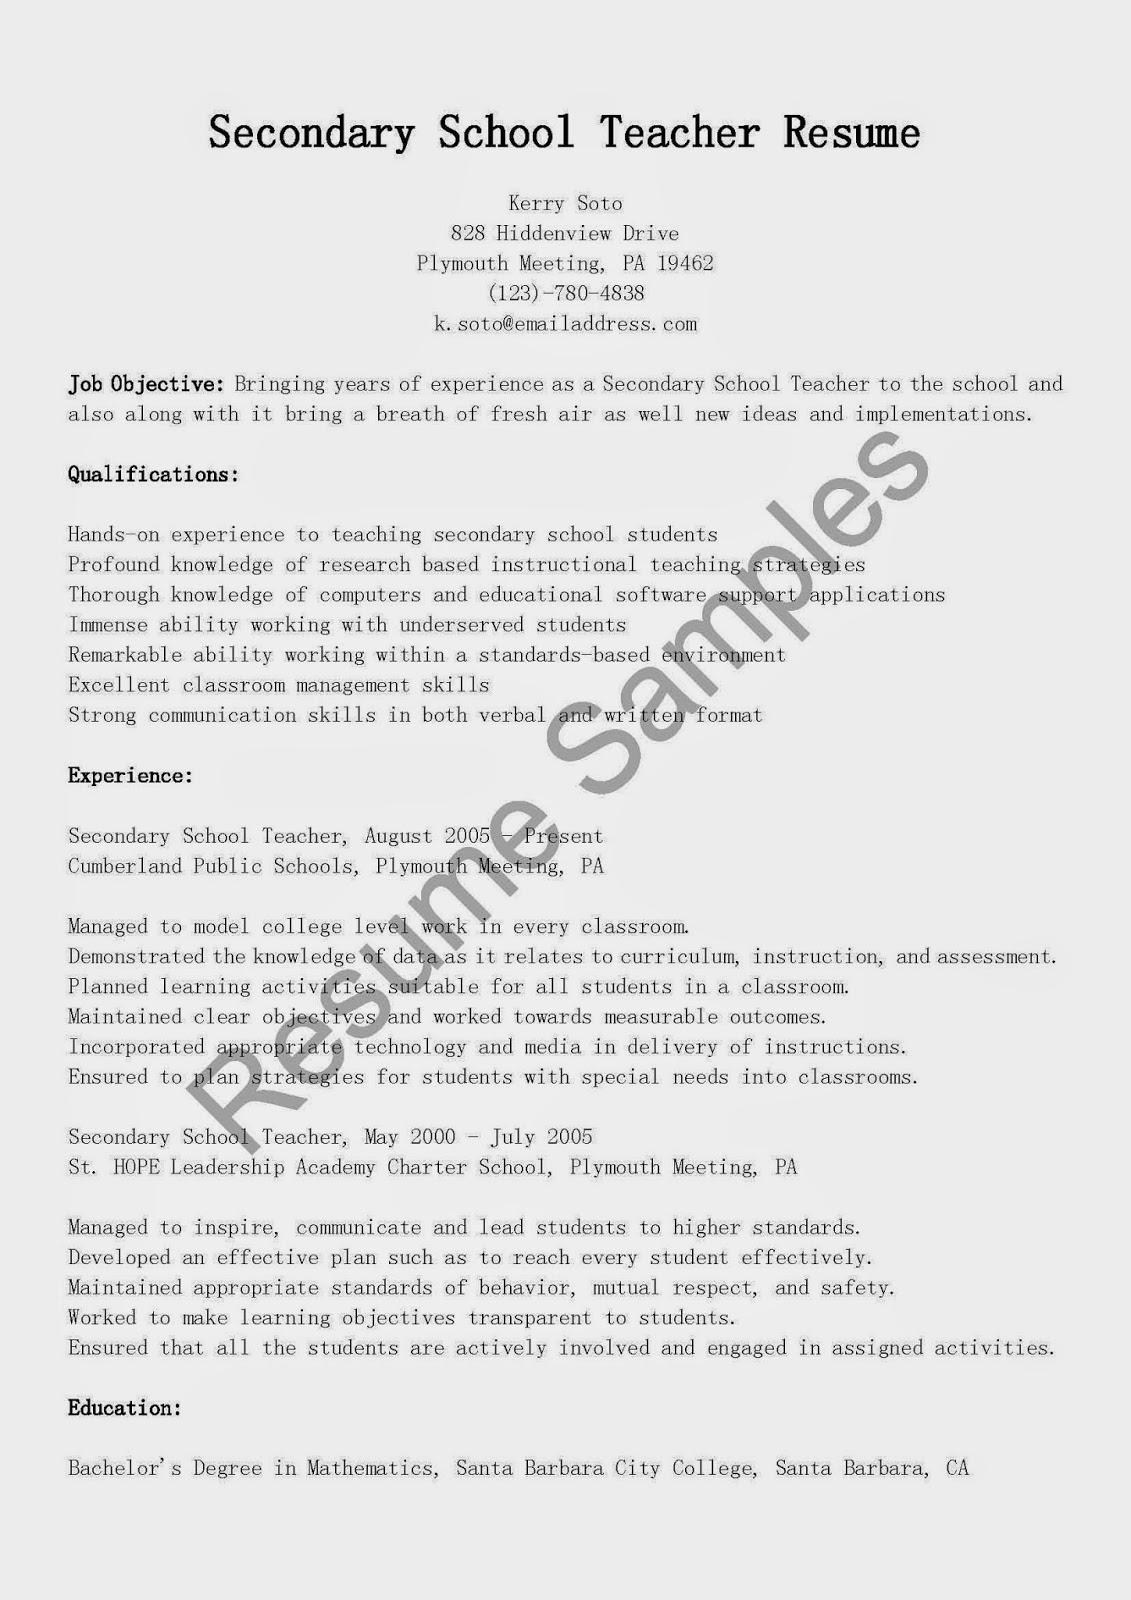 Resume Sample Student College Student Resume Best Sample Resume Resume Samples Secondary School Teacher Resume Sample